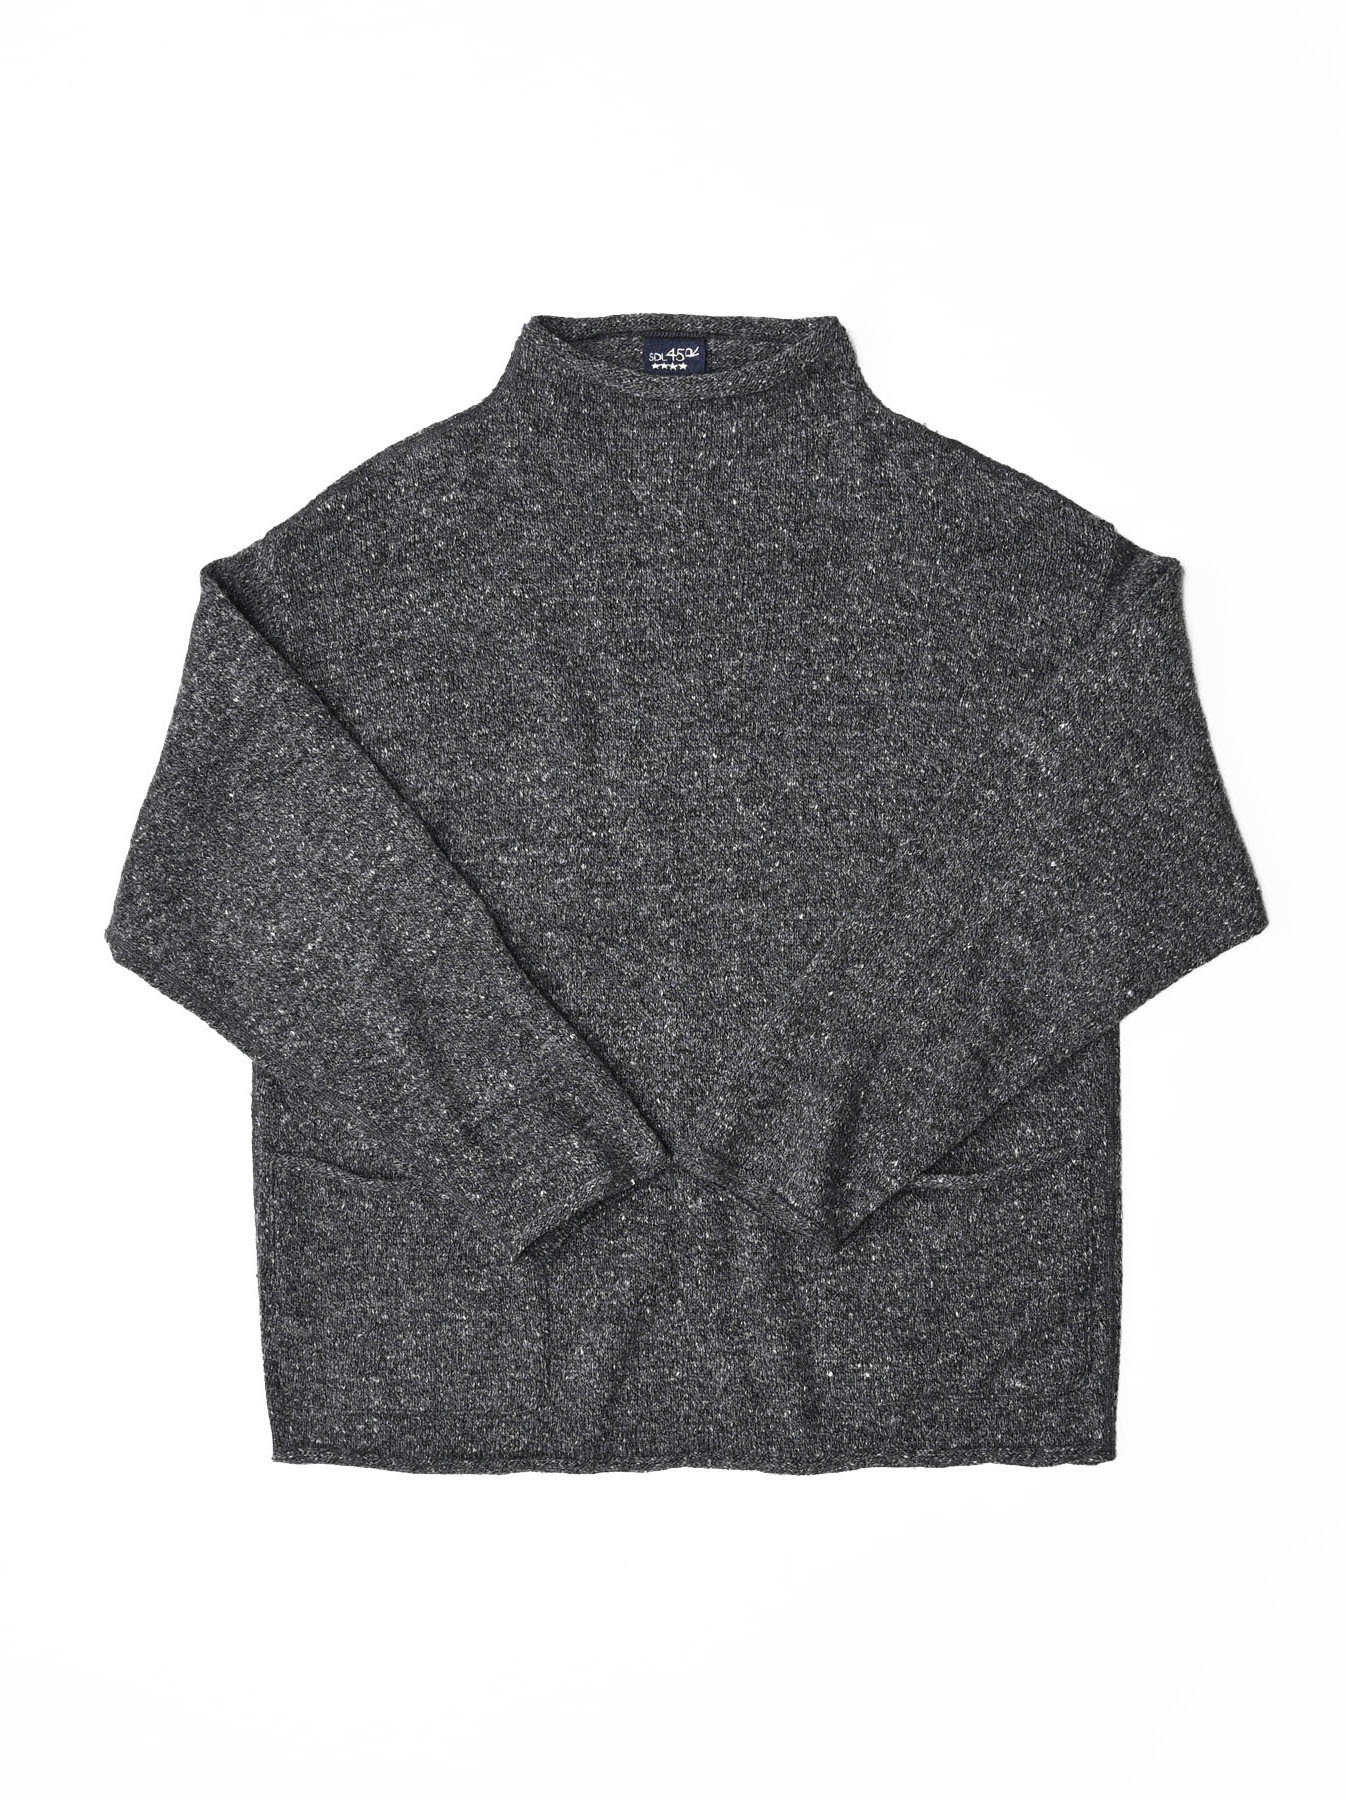 Cotton Shetland Knit-sew Mockneck Sweater-1